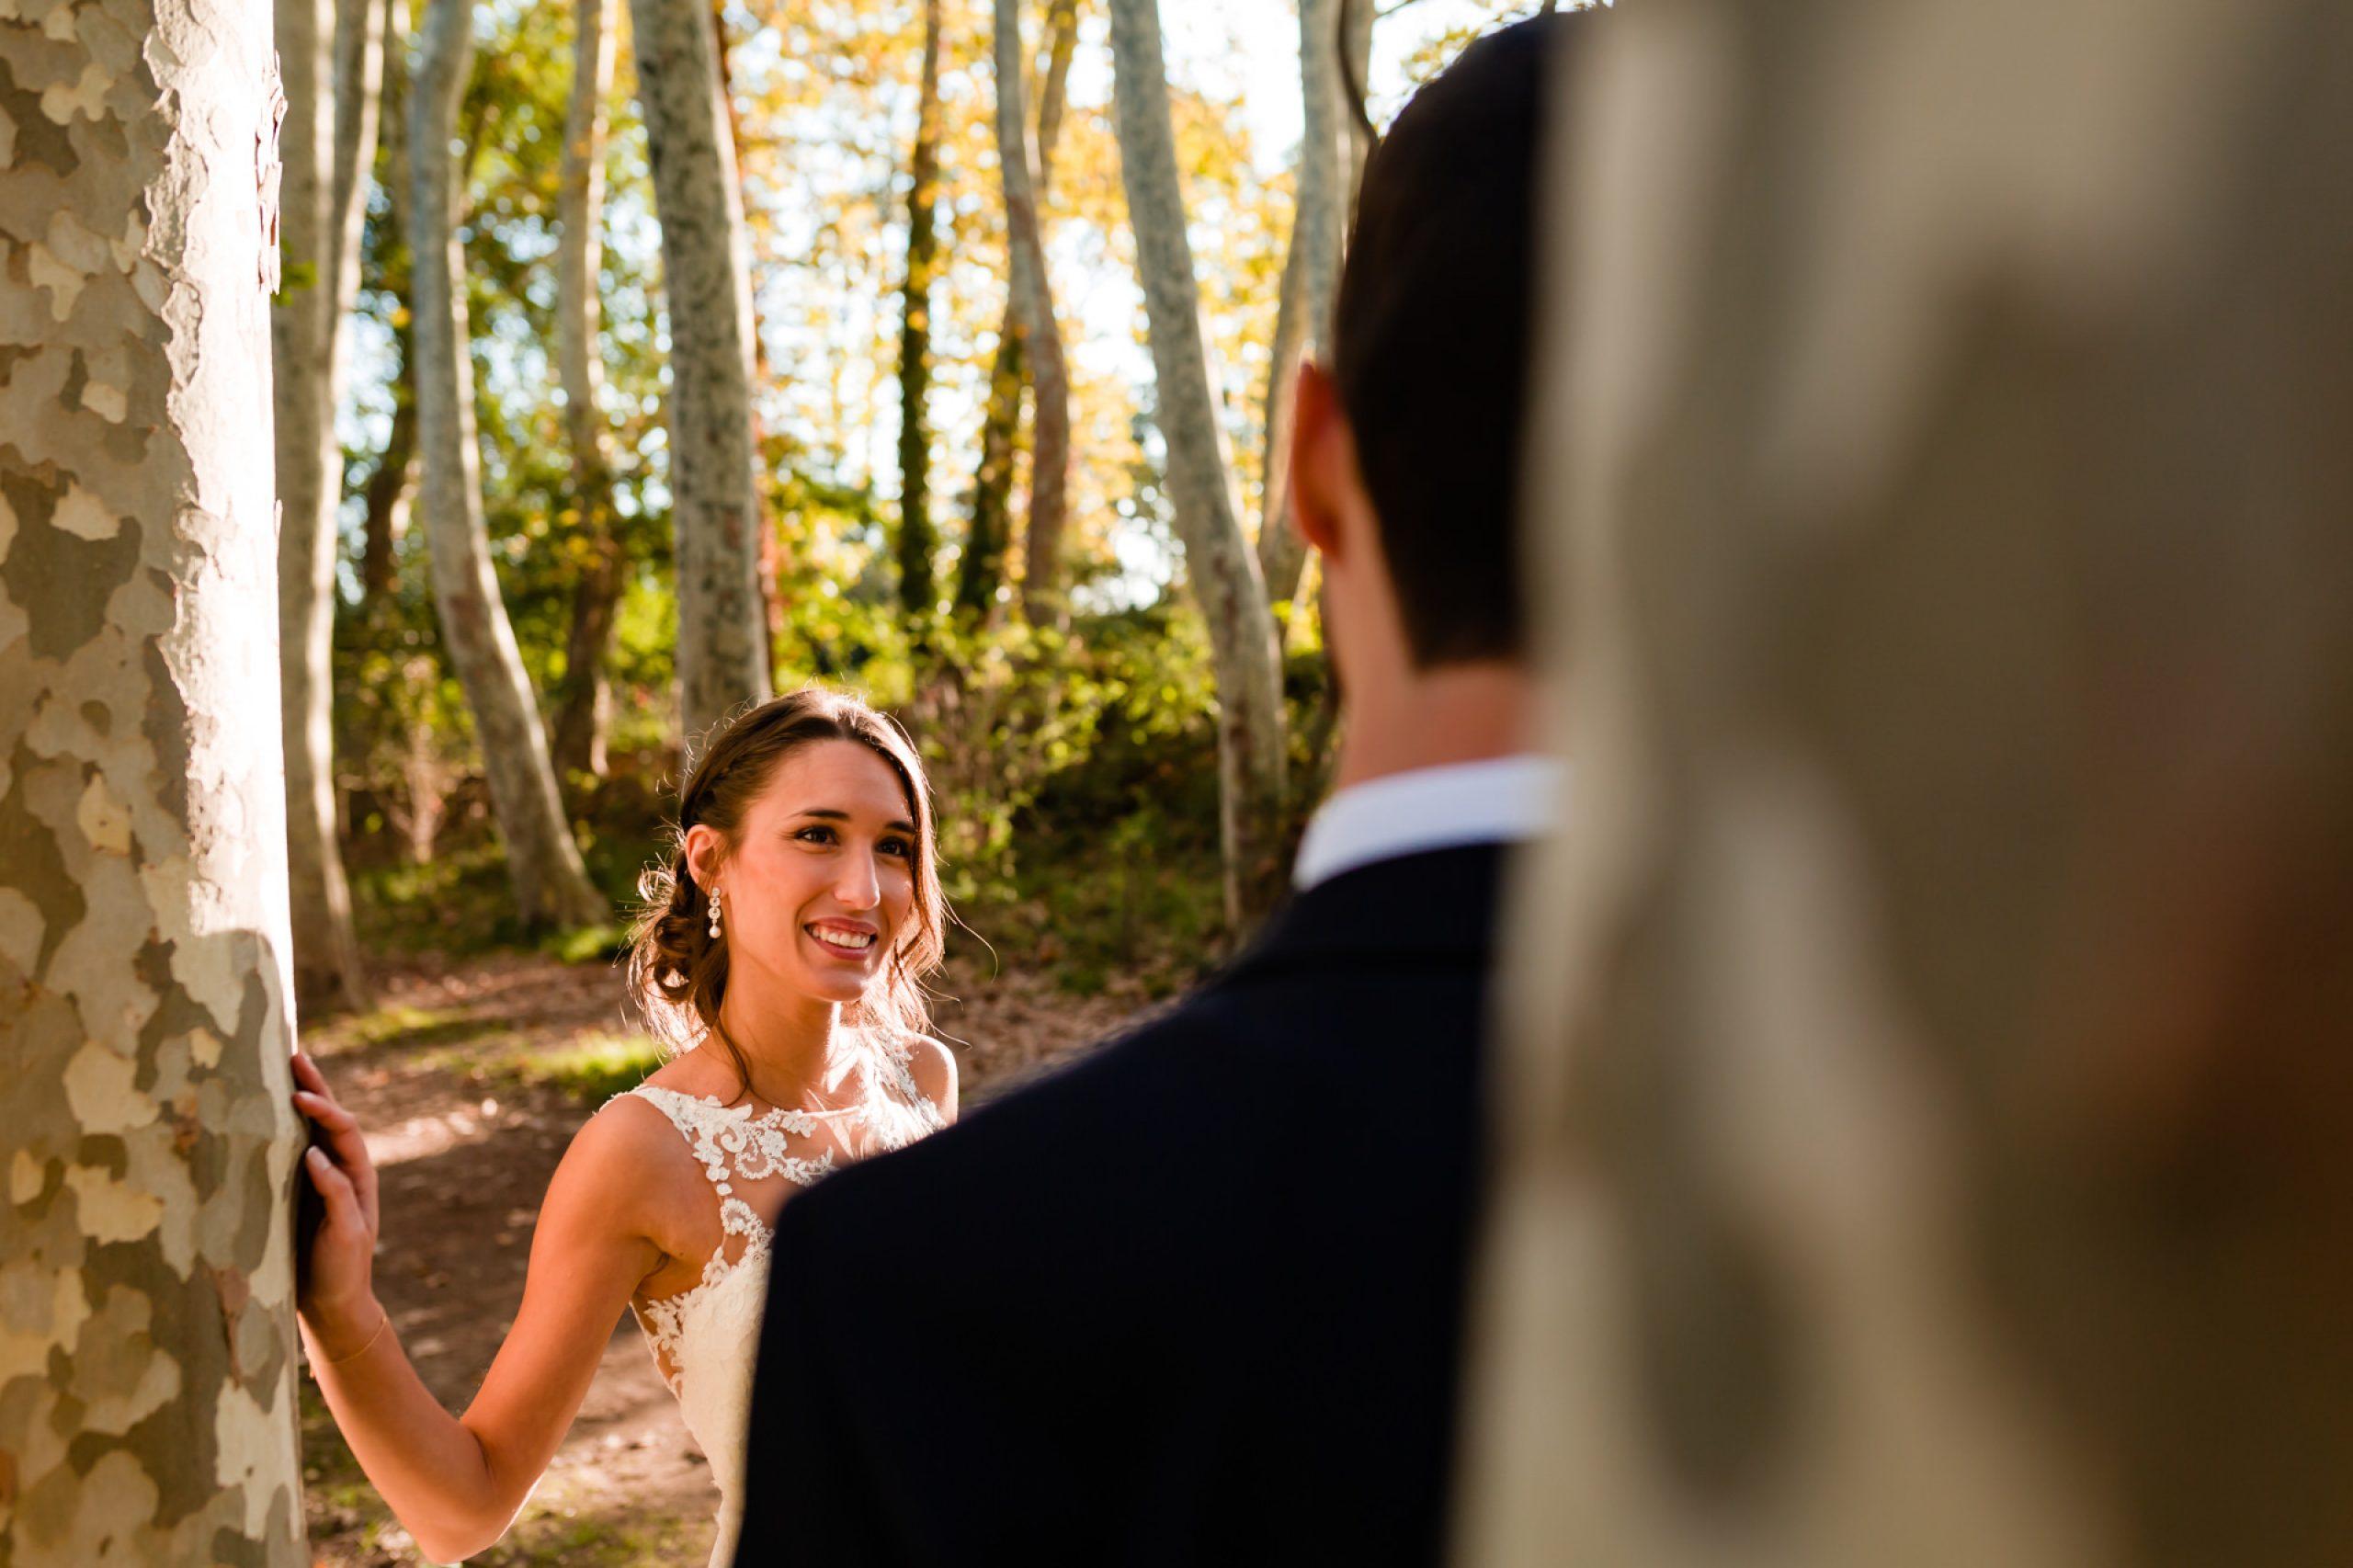 LuzdeBarcelona-postboda-boda-fotografo-cerdanyola-27